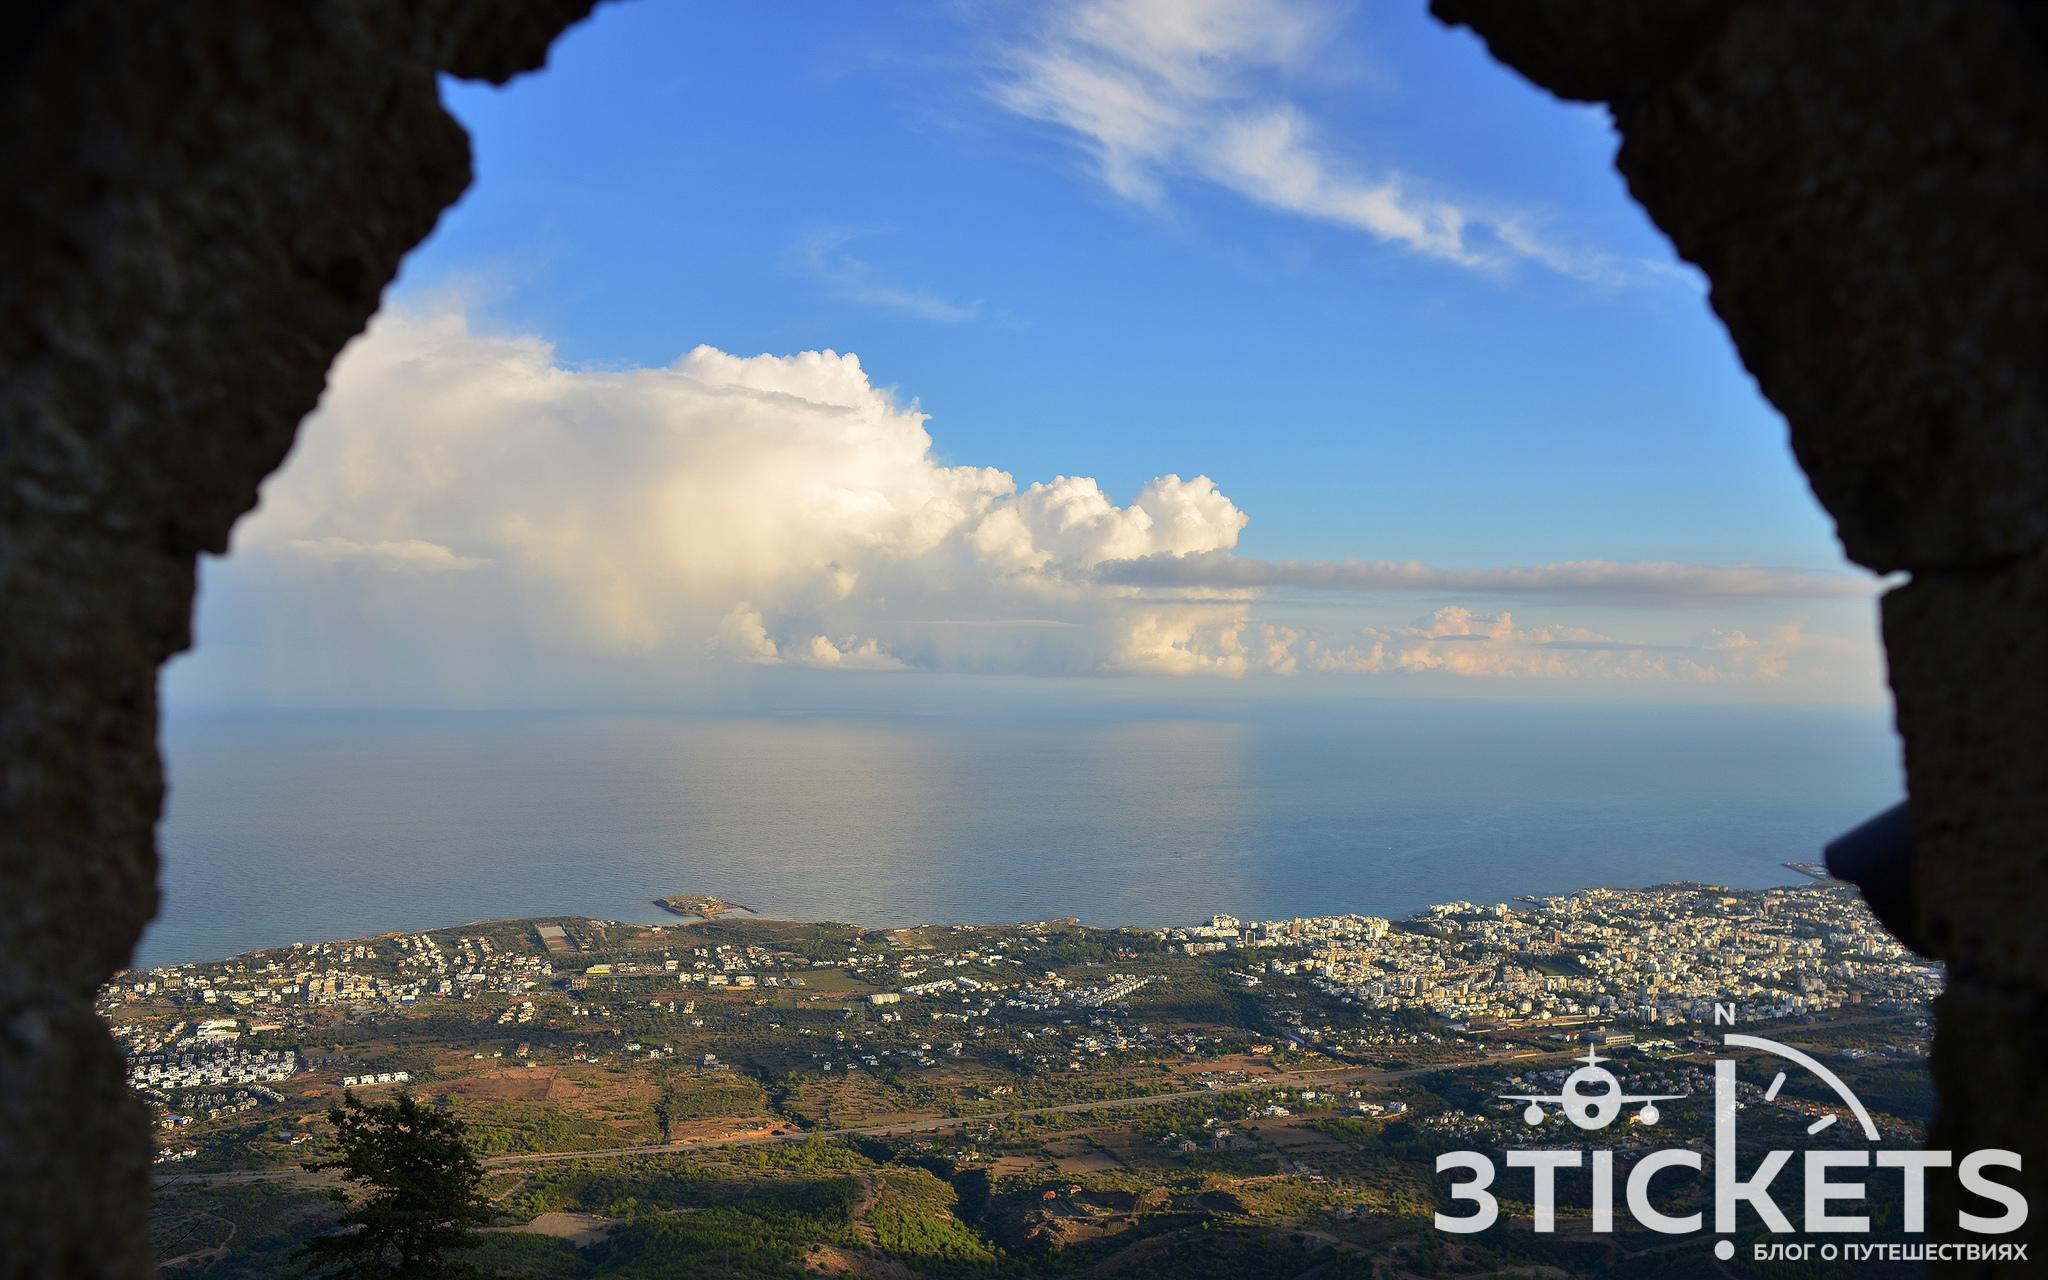 Замок Святого Иллариона на Северном Кипре, Кирения